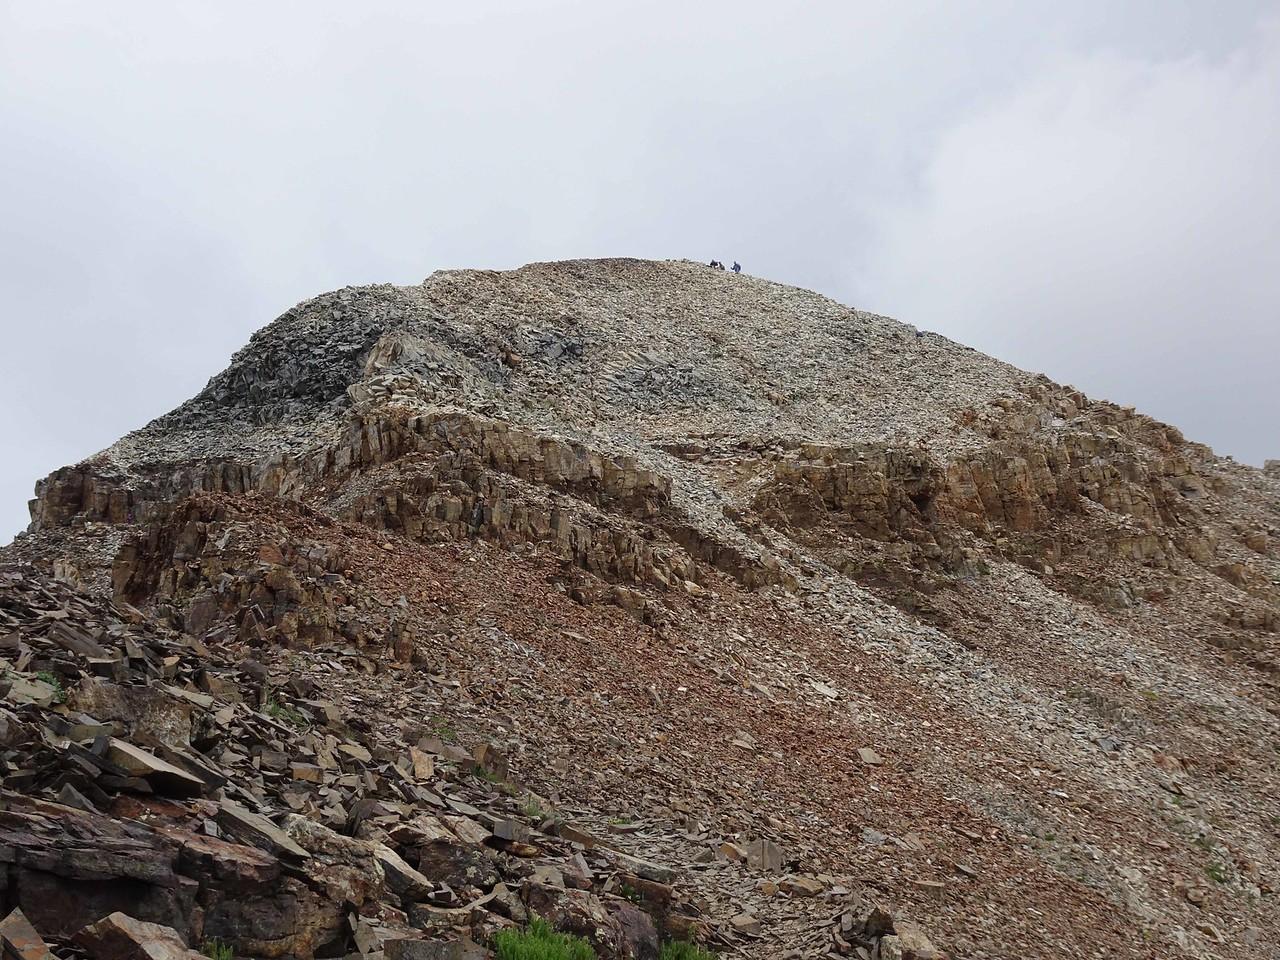 71 The summit ahead